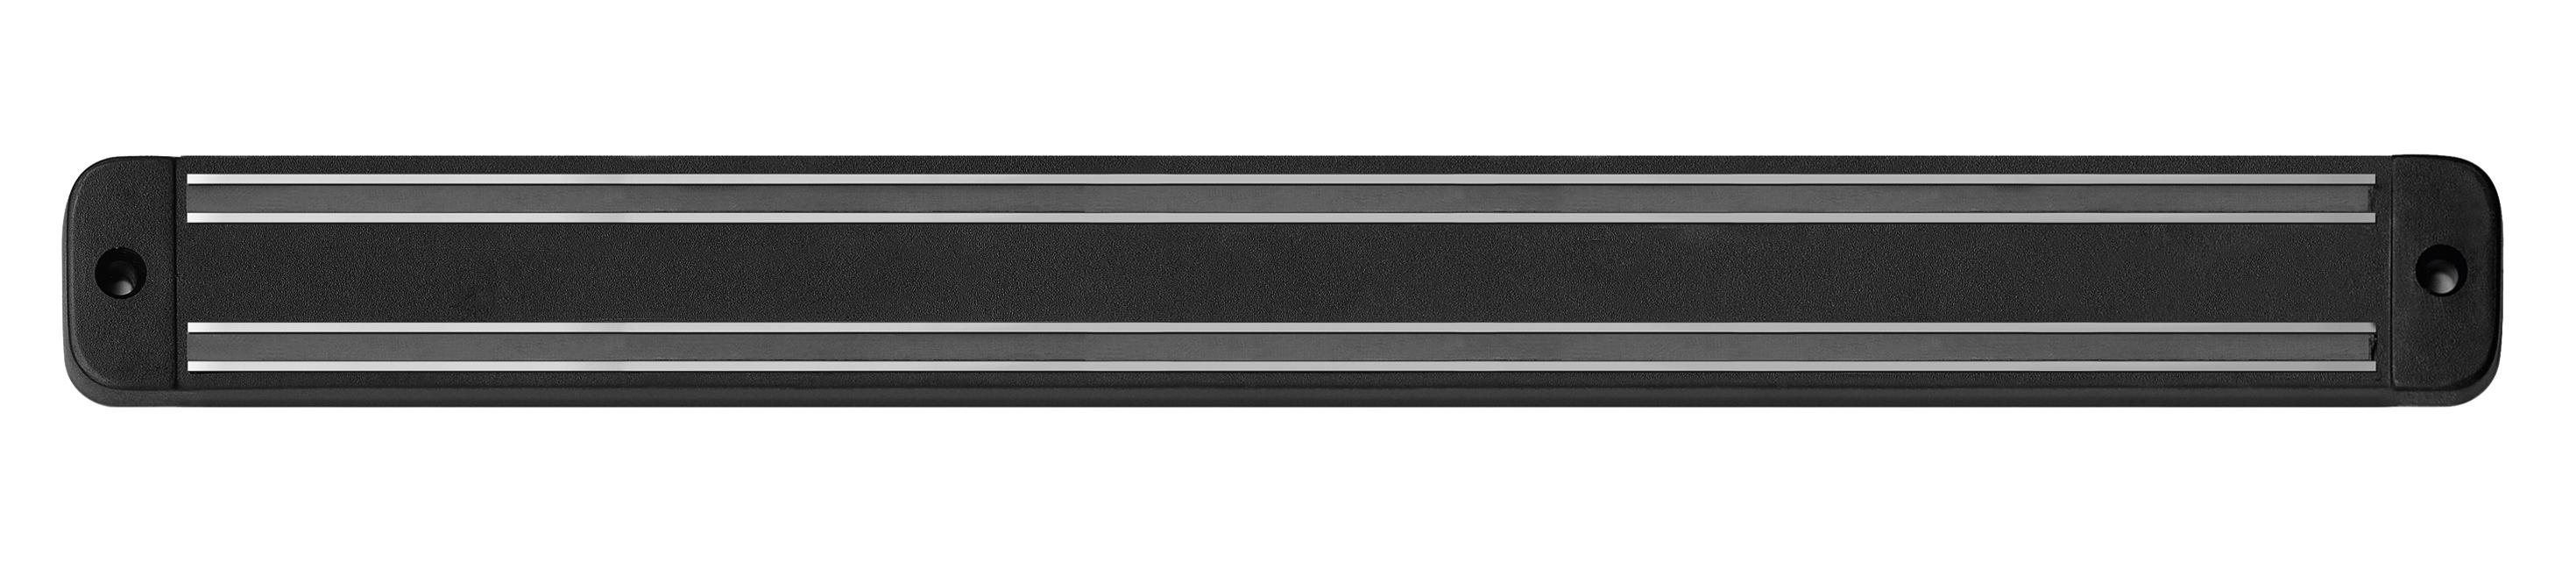 SOLINGEN MAGNETSKI STALAK ZA NOŽEVE 33cm